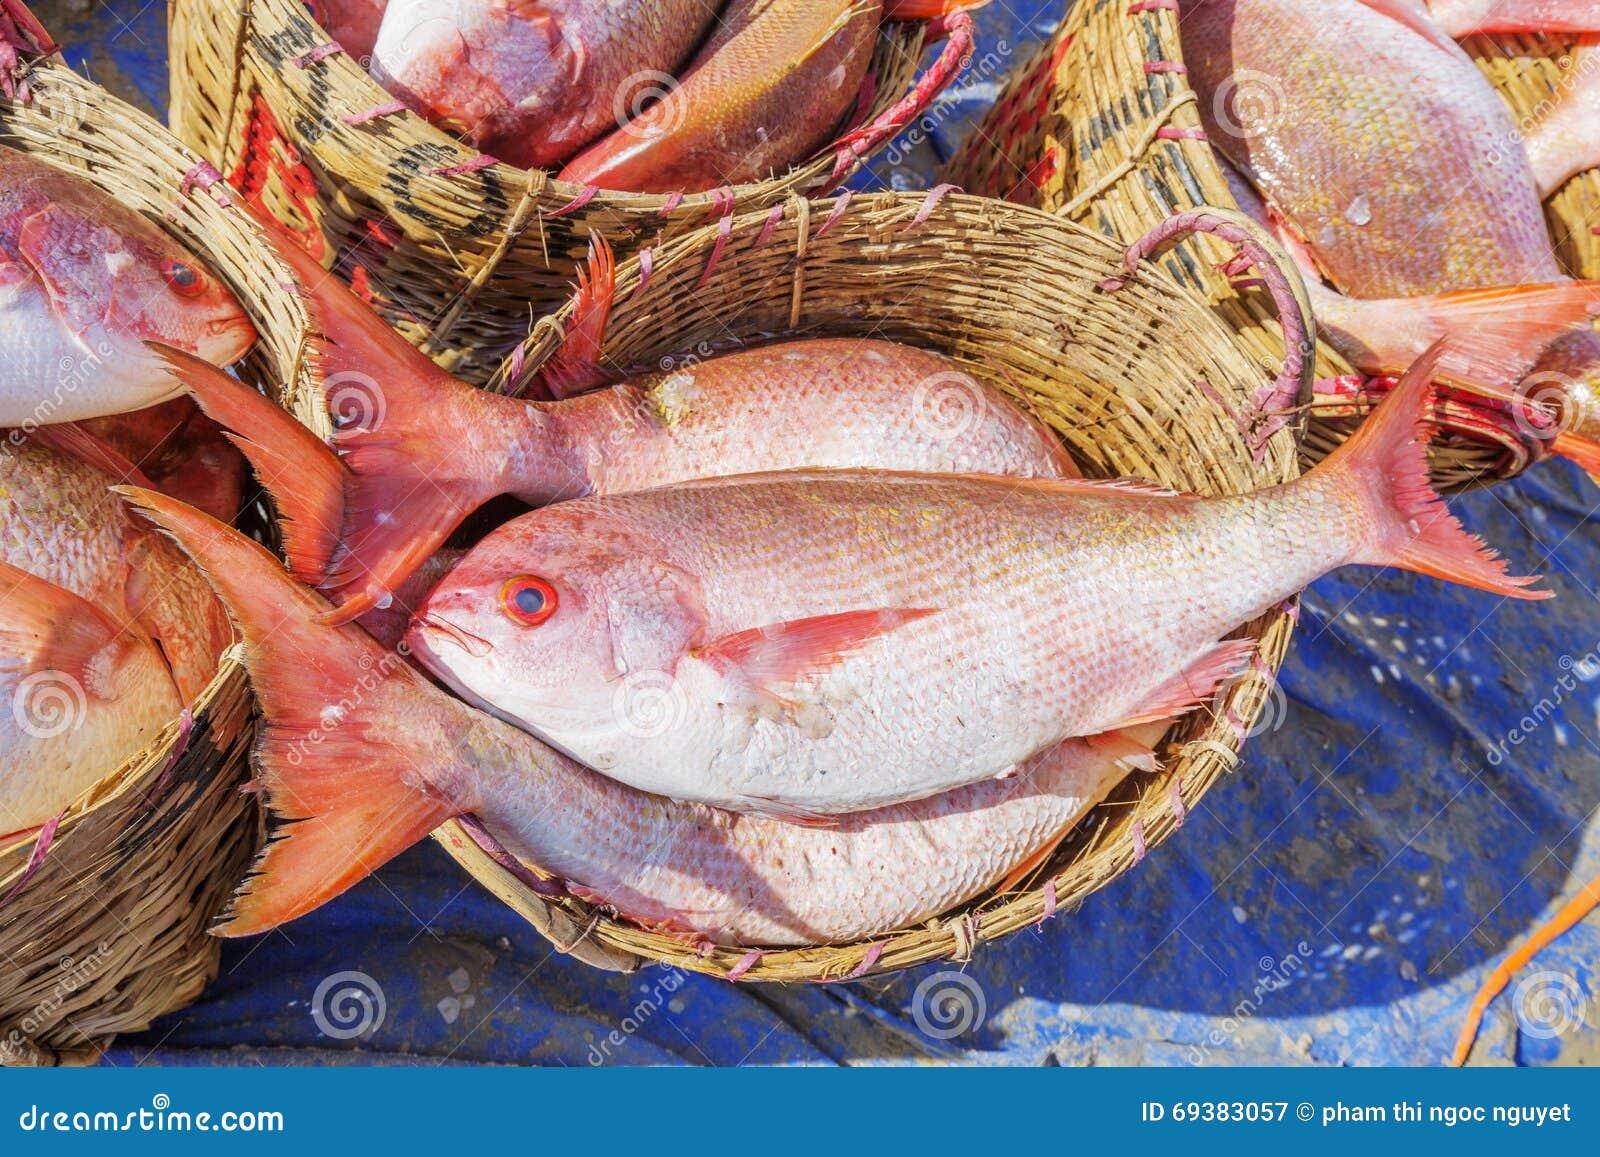 Fresh fish in basket at long hai fish market stock image for Closest fish market